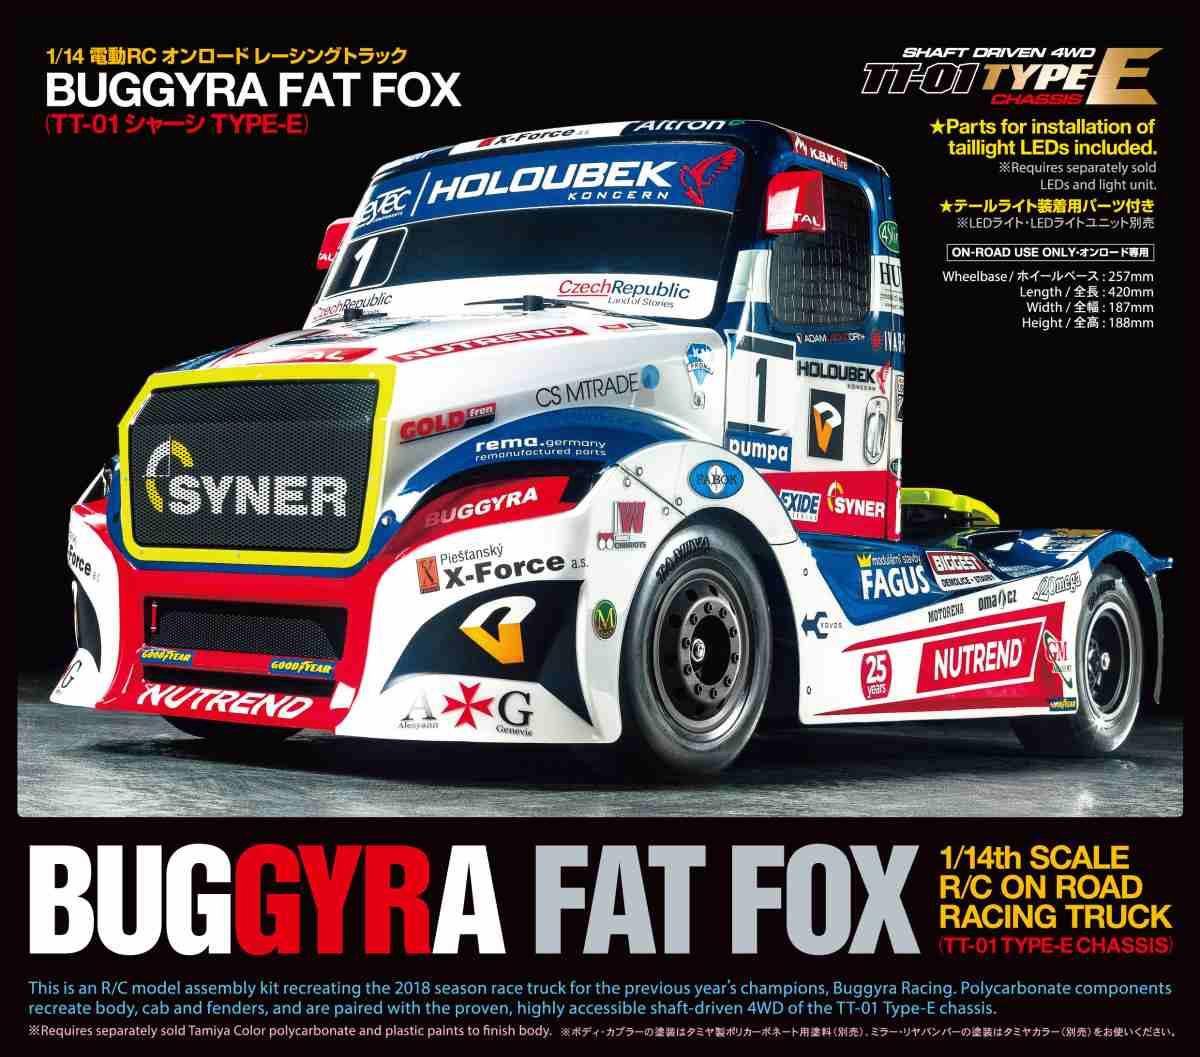 TT01E Buggyra Fat Fox